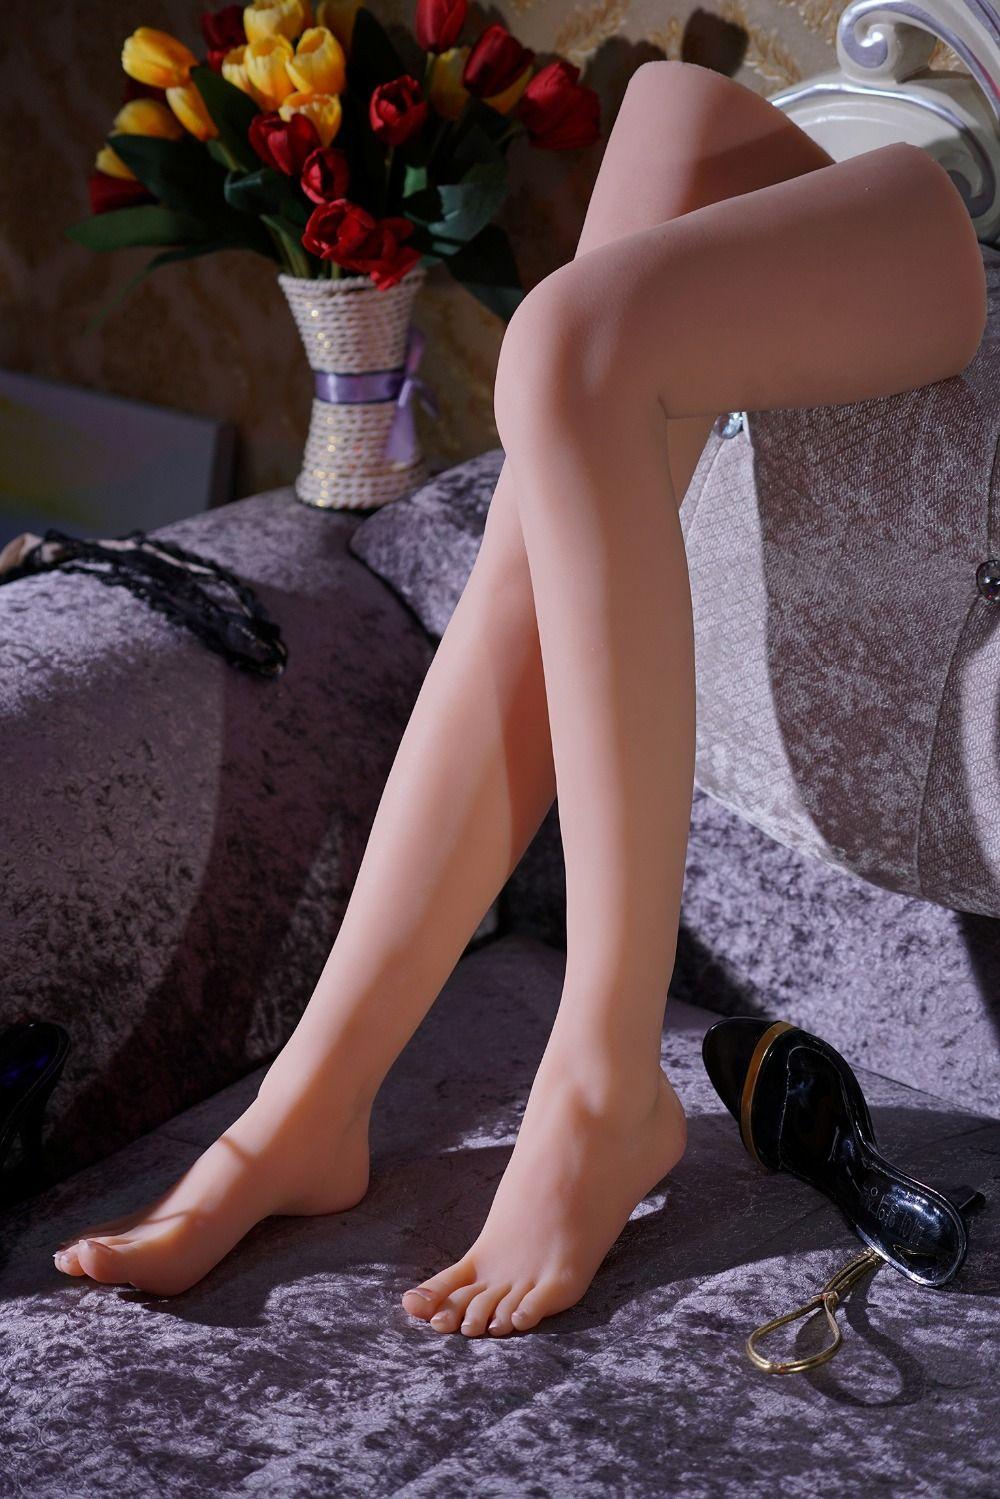 newest girls ballerina dancer gymnast foot feet pointed toes fetish toys model